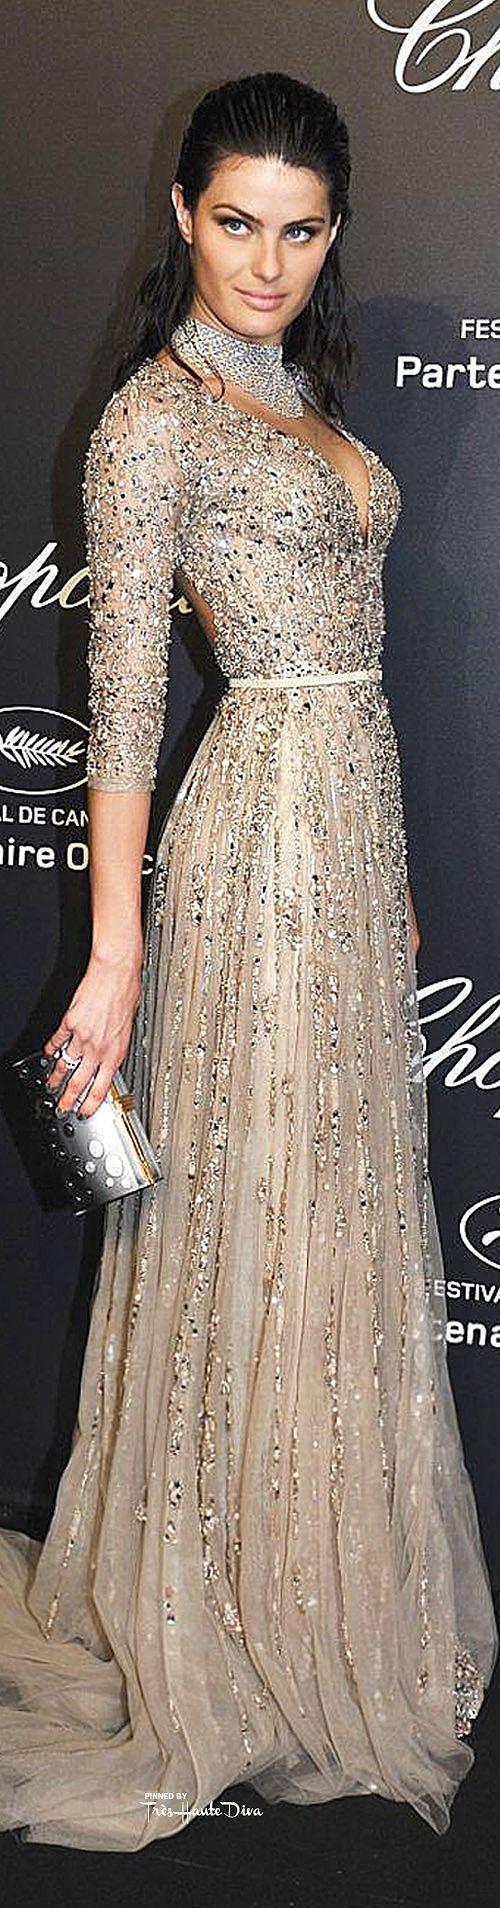 223 best ReDCaRpeT images on Pinterest | Best dressed, Burgundy rugs ...